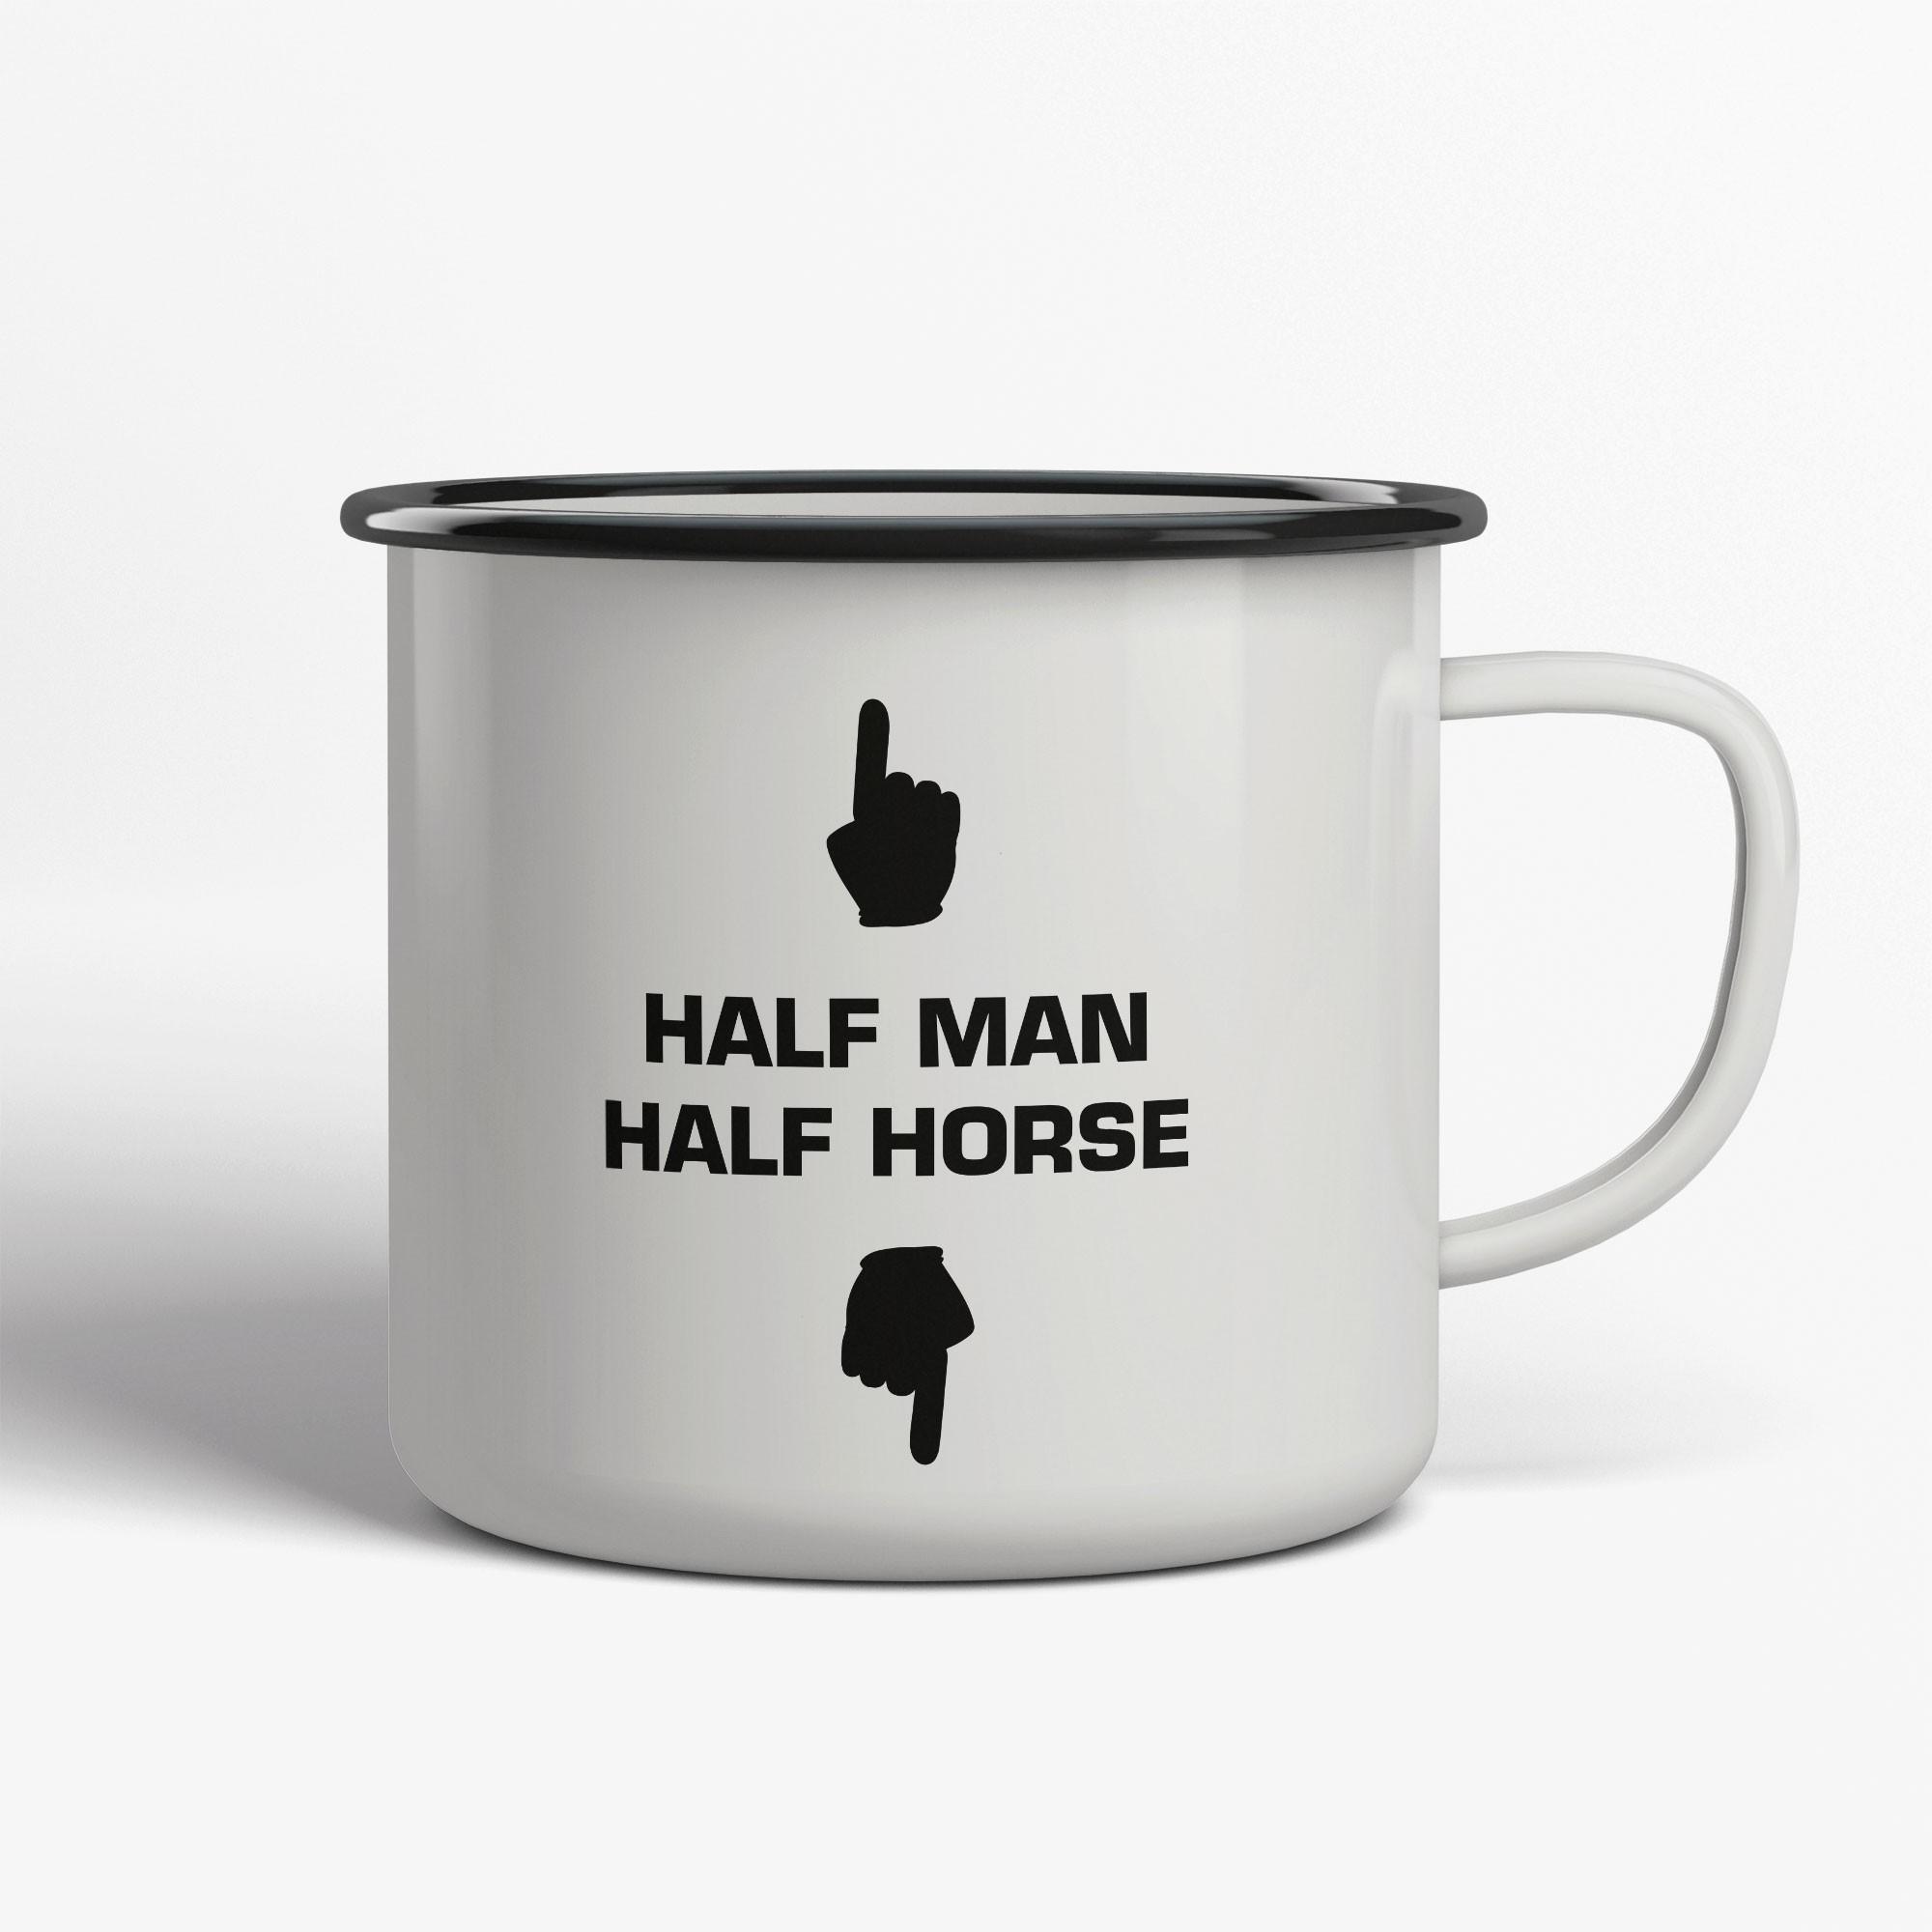 Half Man Halfe Horse Emaljmugg